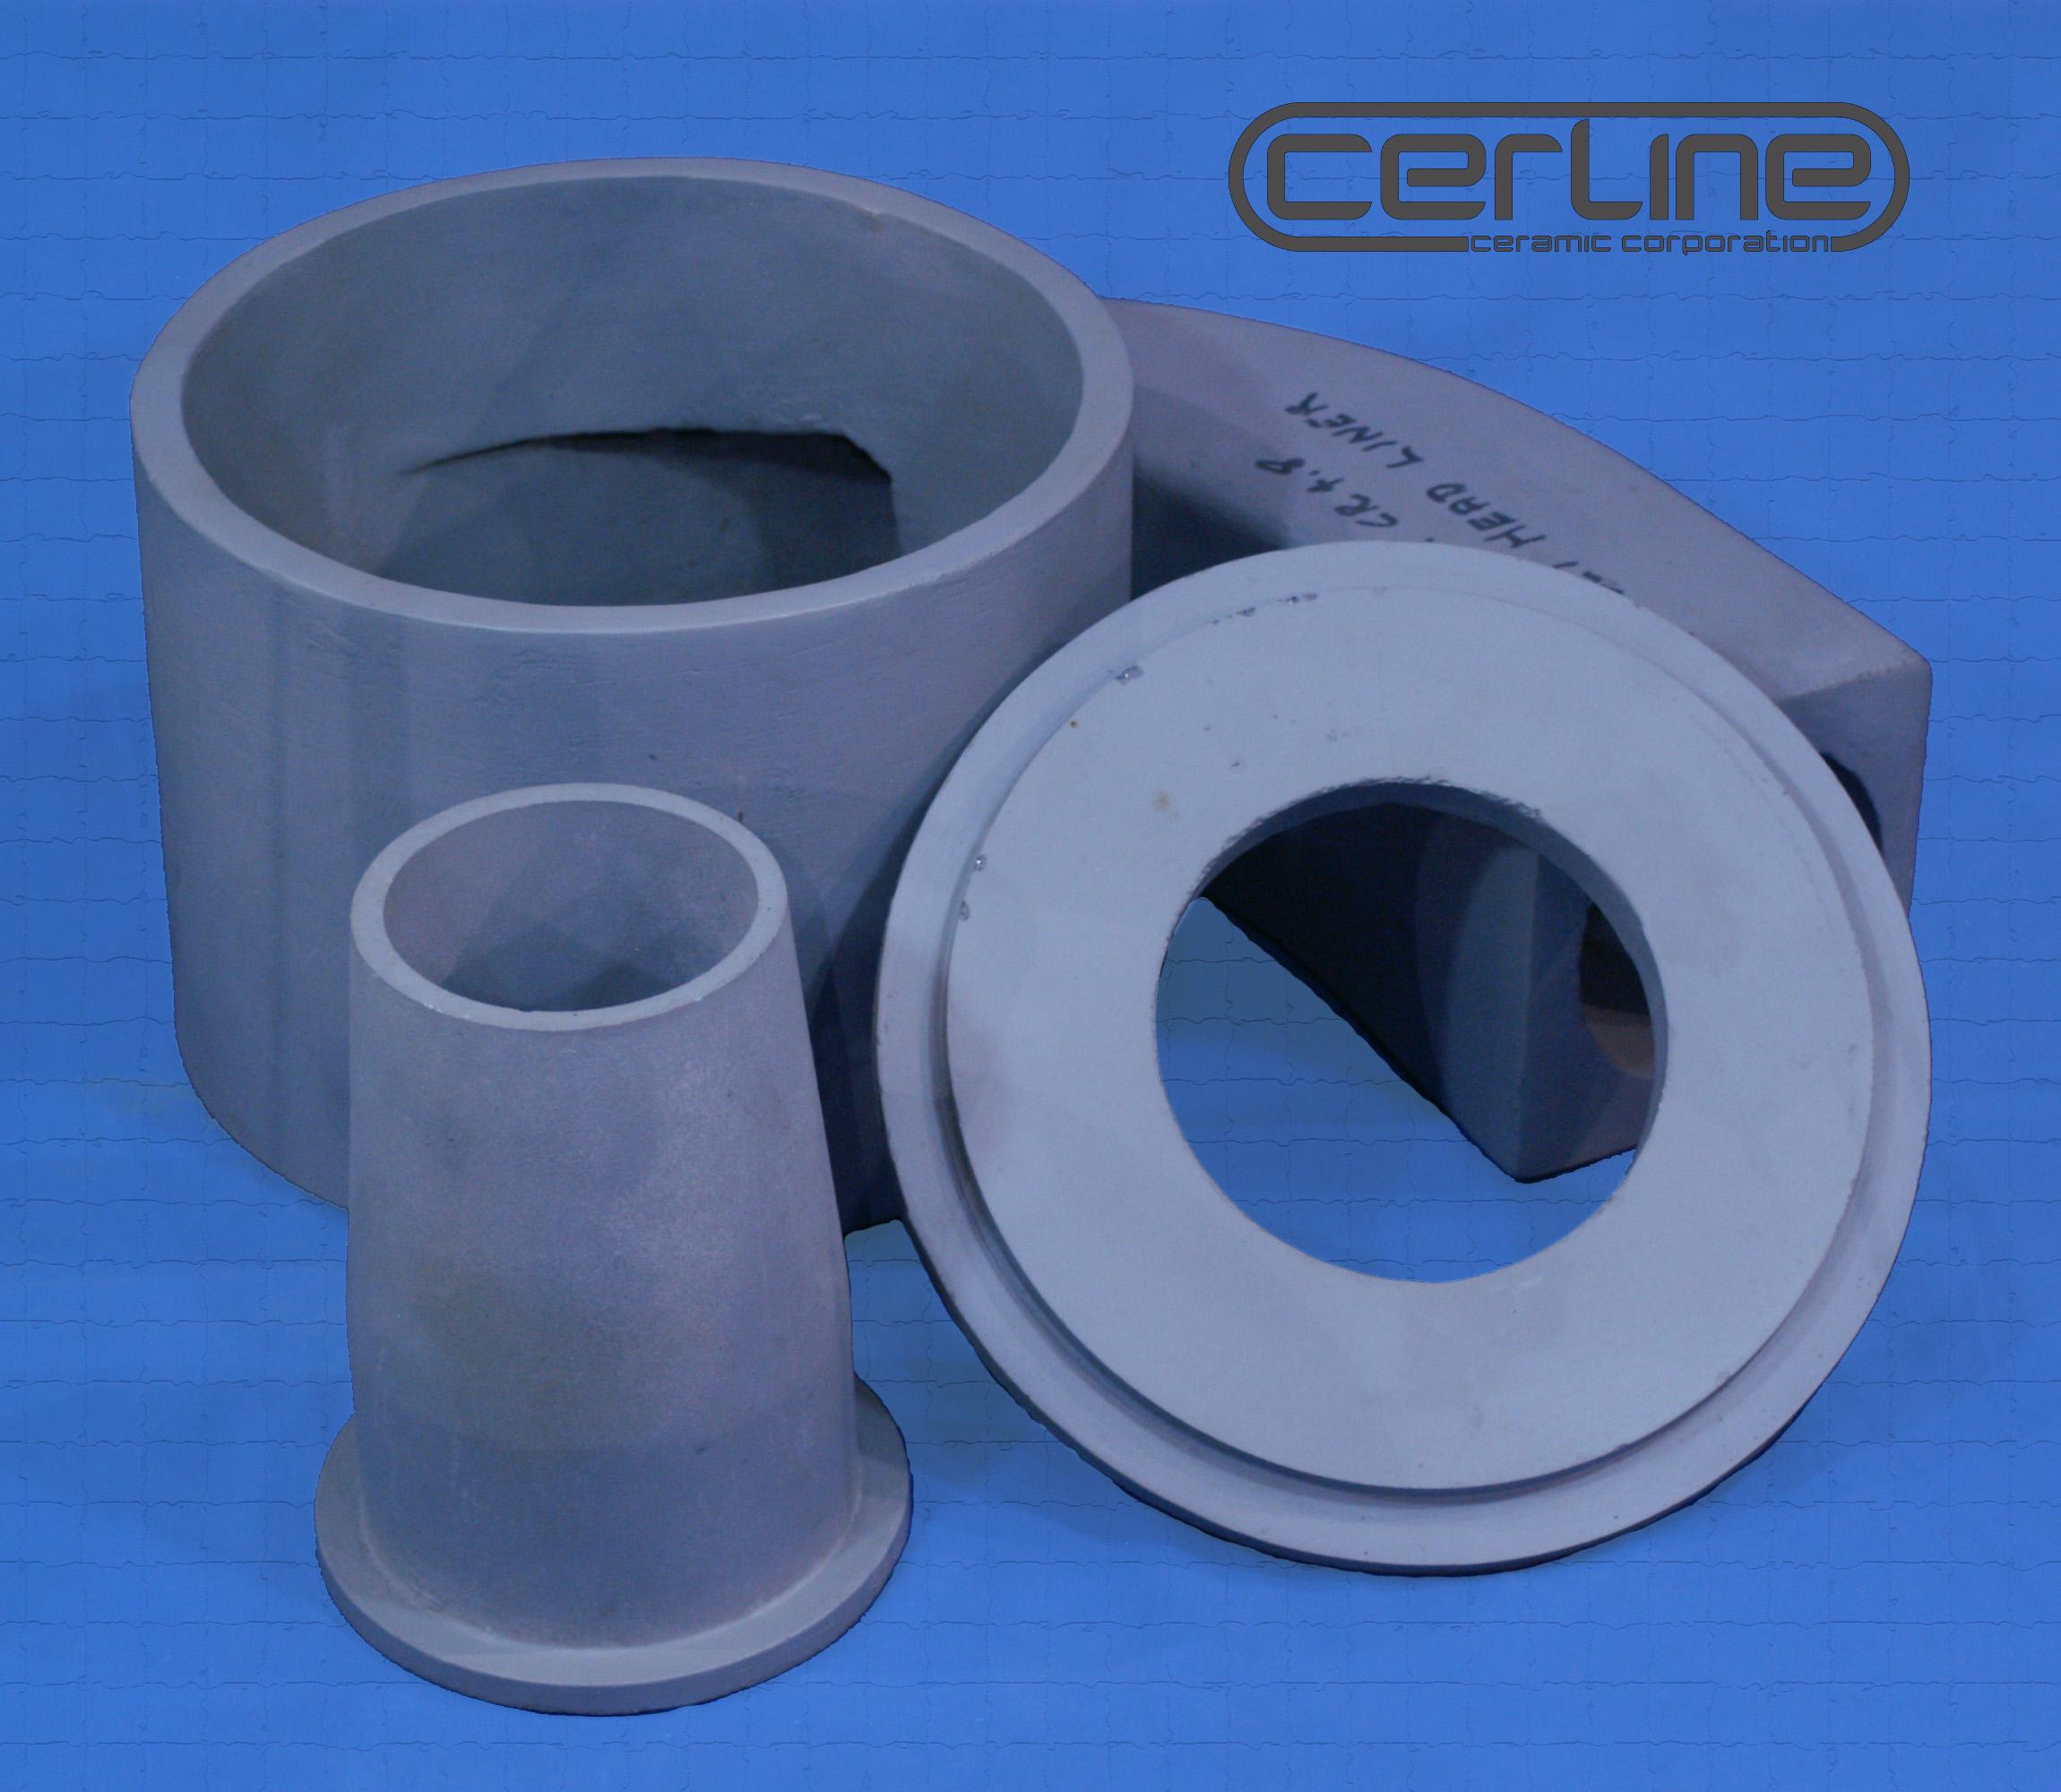 Cerline Abrasive Resistant Ceramic Head Liners